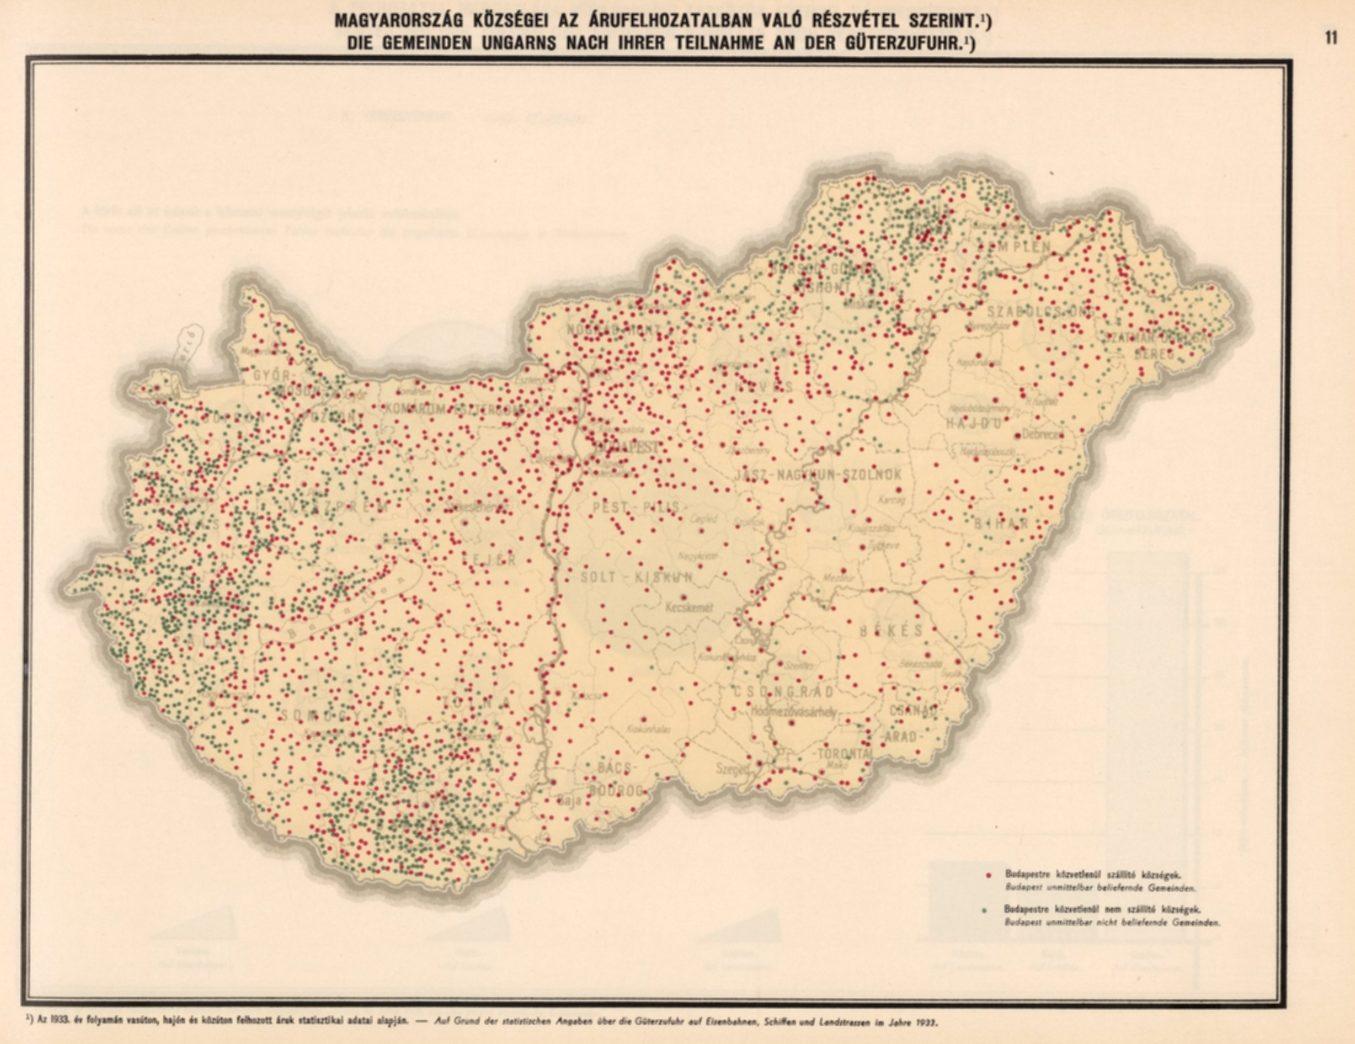 Lajos Illyefalvi Map Hungary Budapest